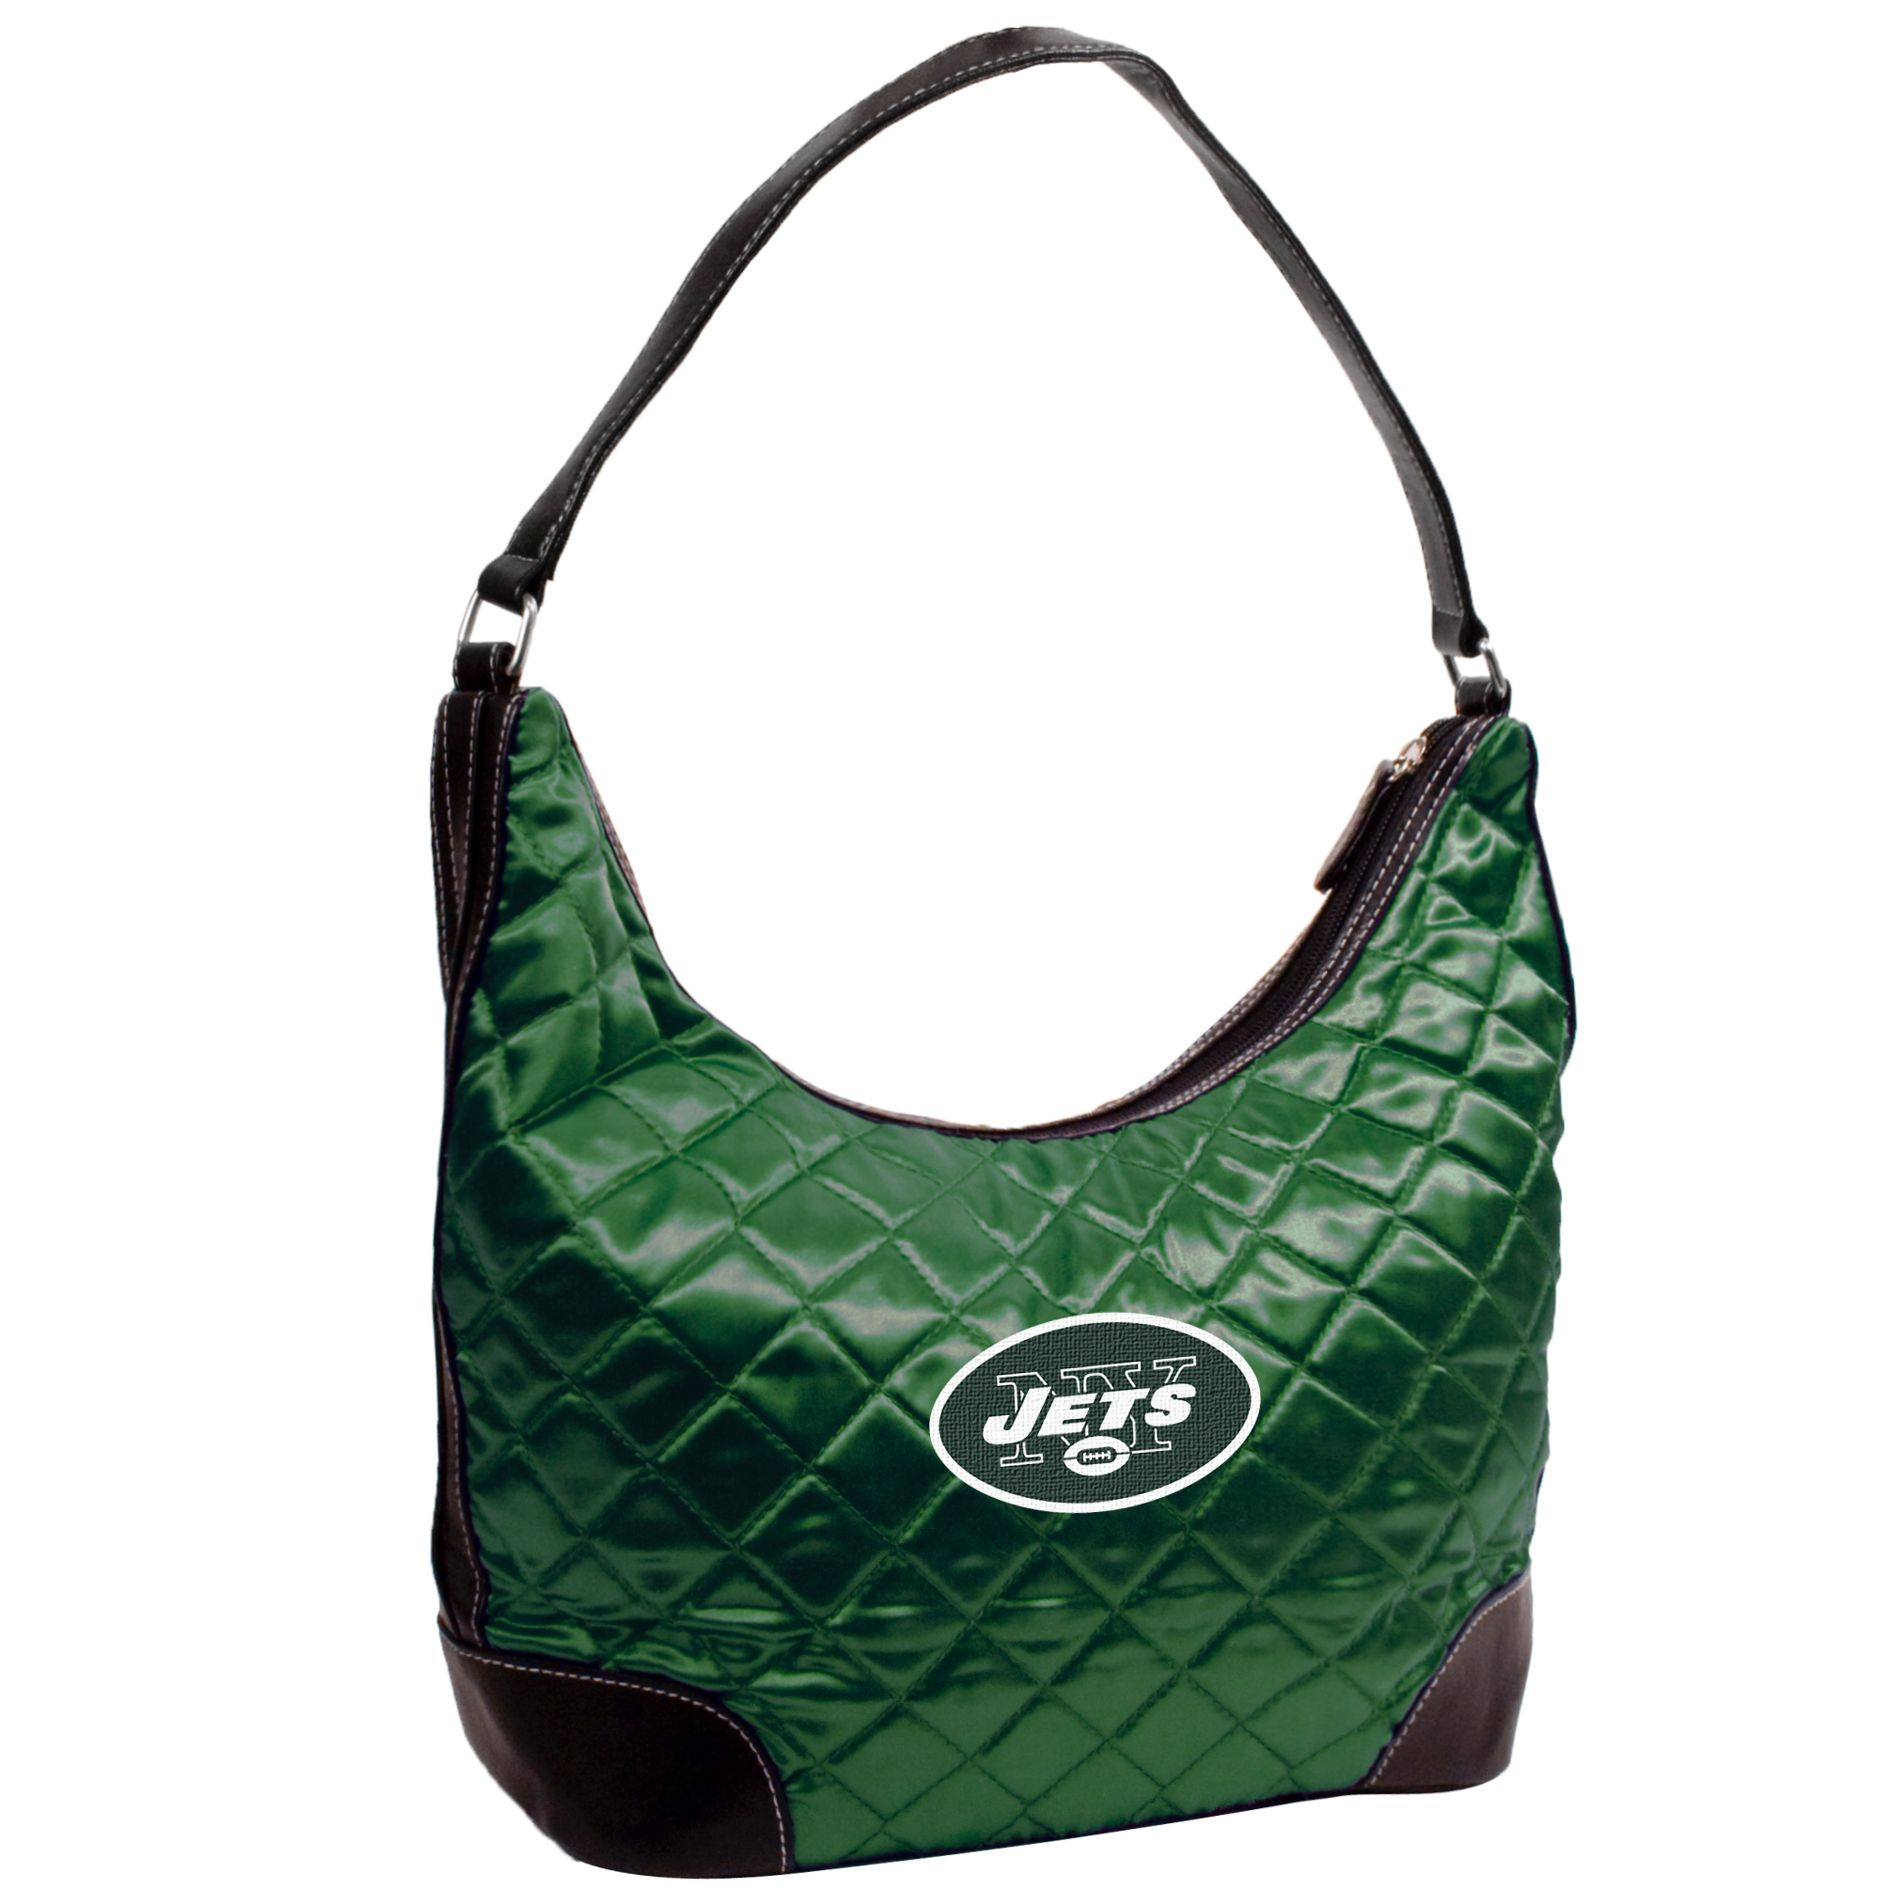 Little Earth New York Jets Quilted Hobo Handbag